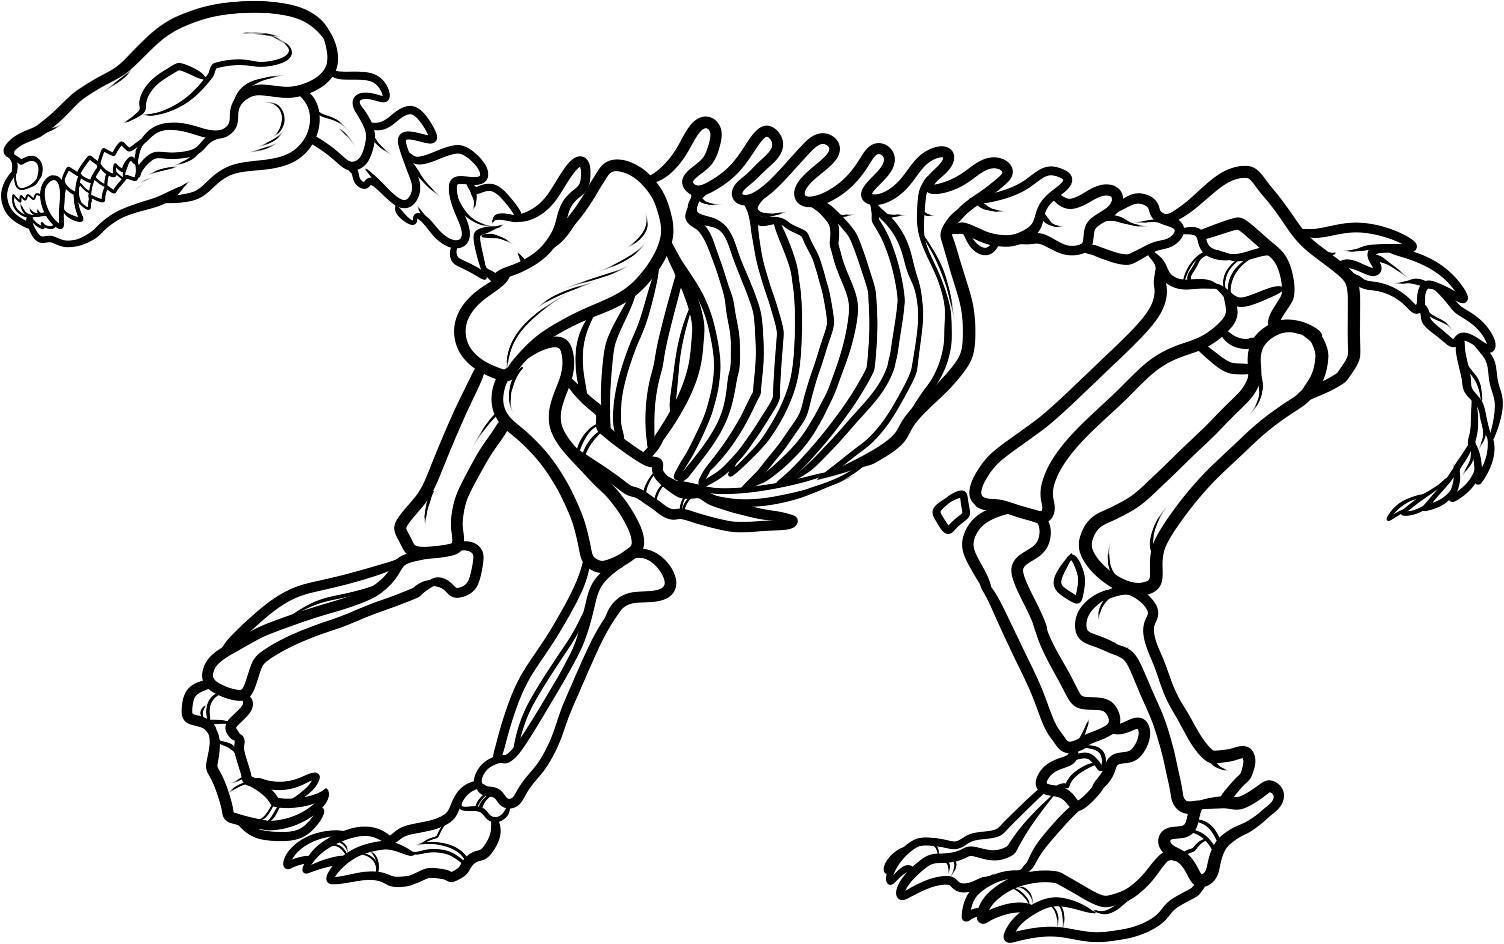 Dinosaur Skeleton Clip Art Free Clipart Images 2